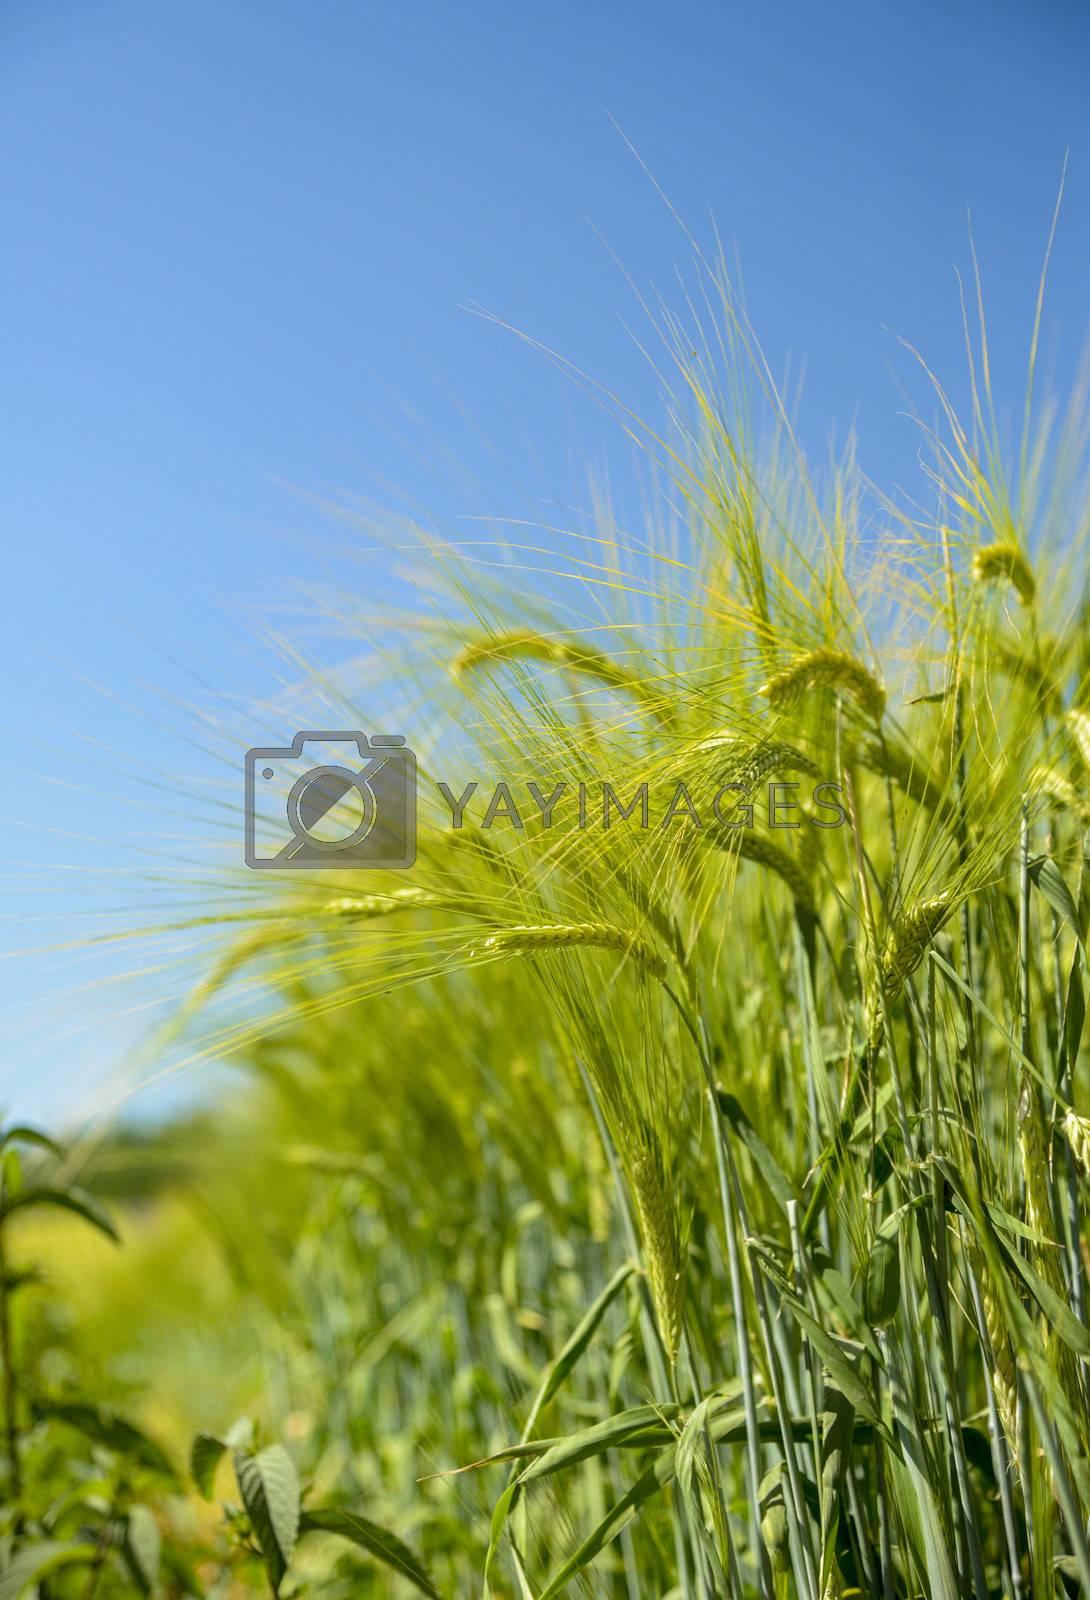 Barley ears with blue sky